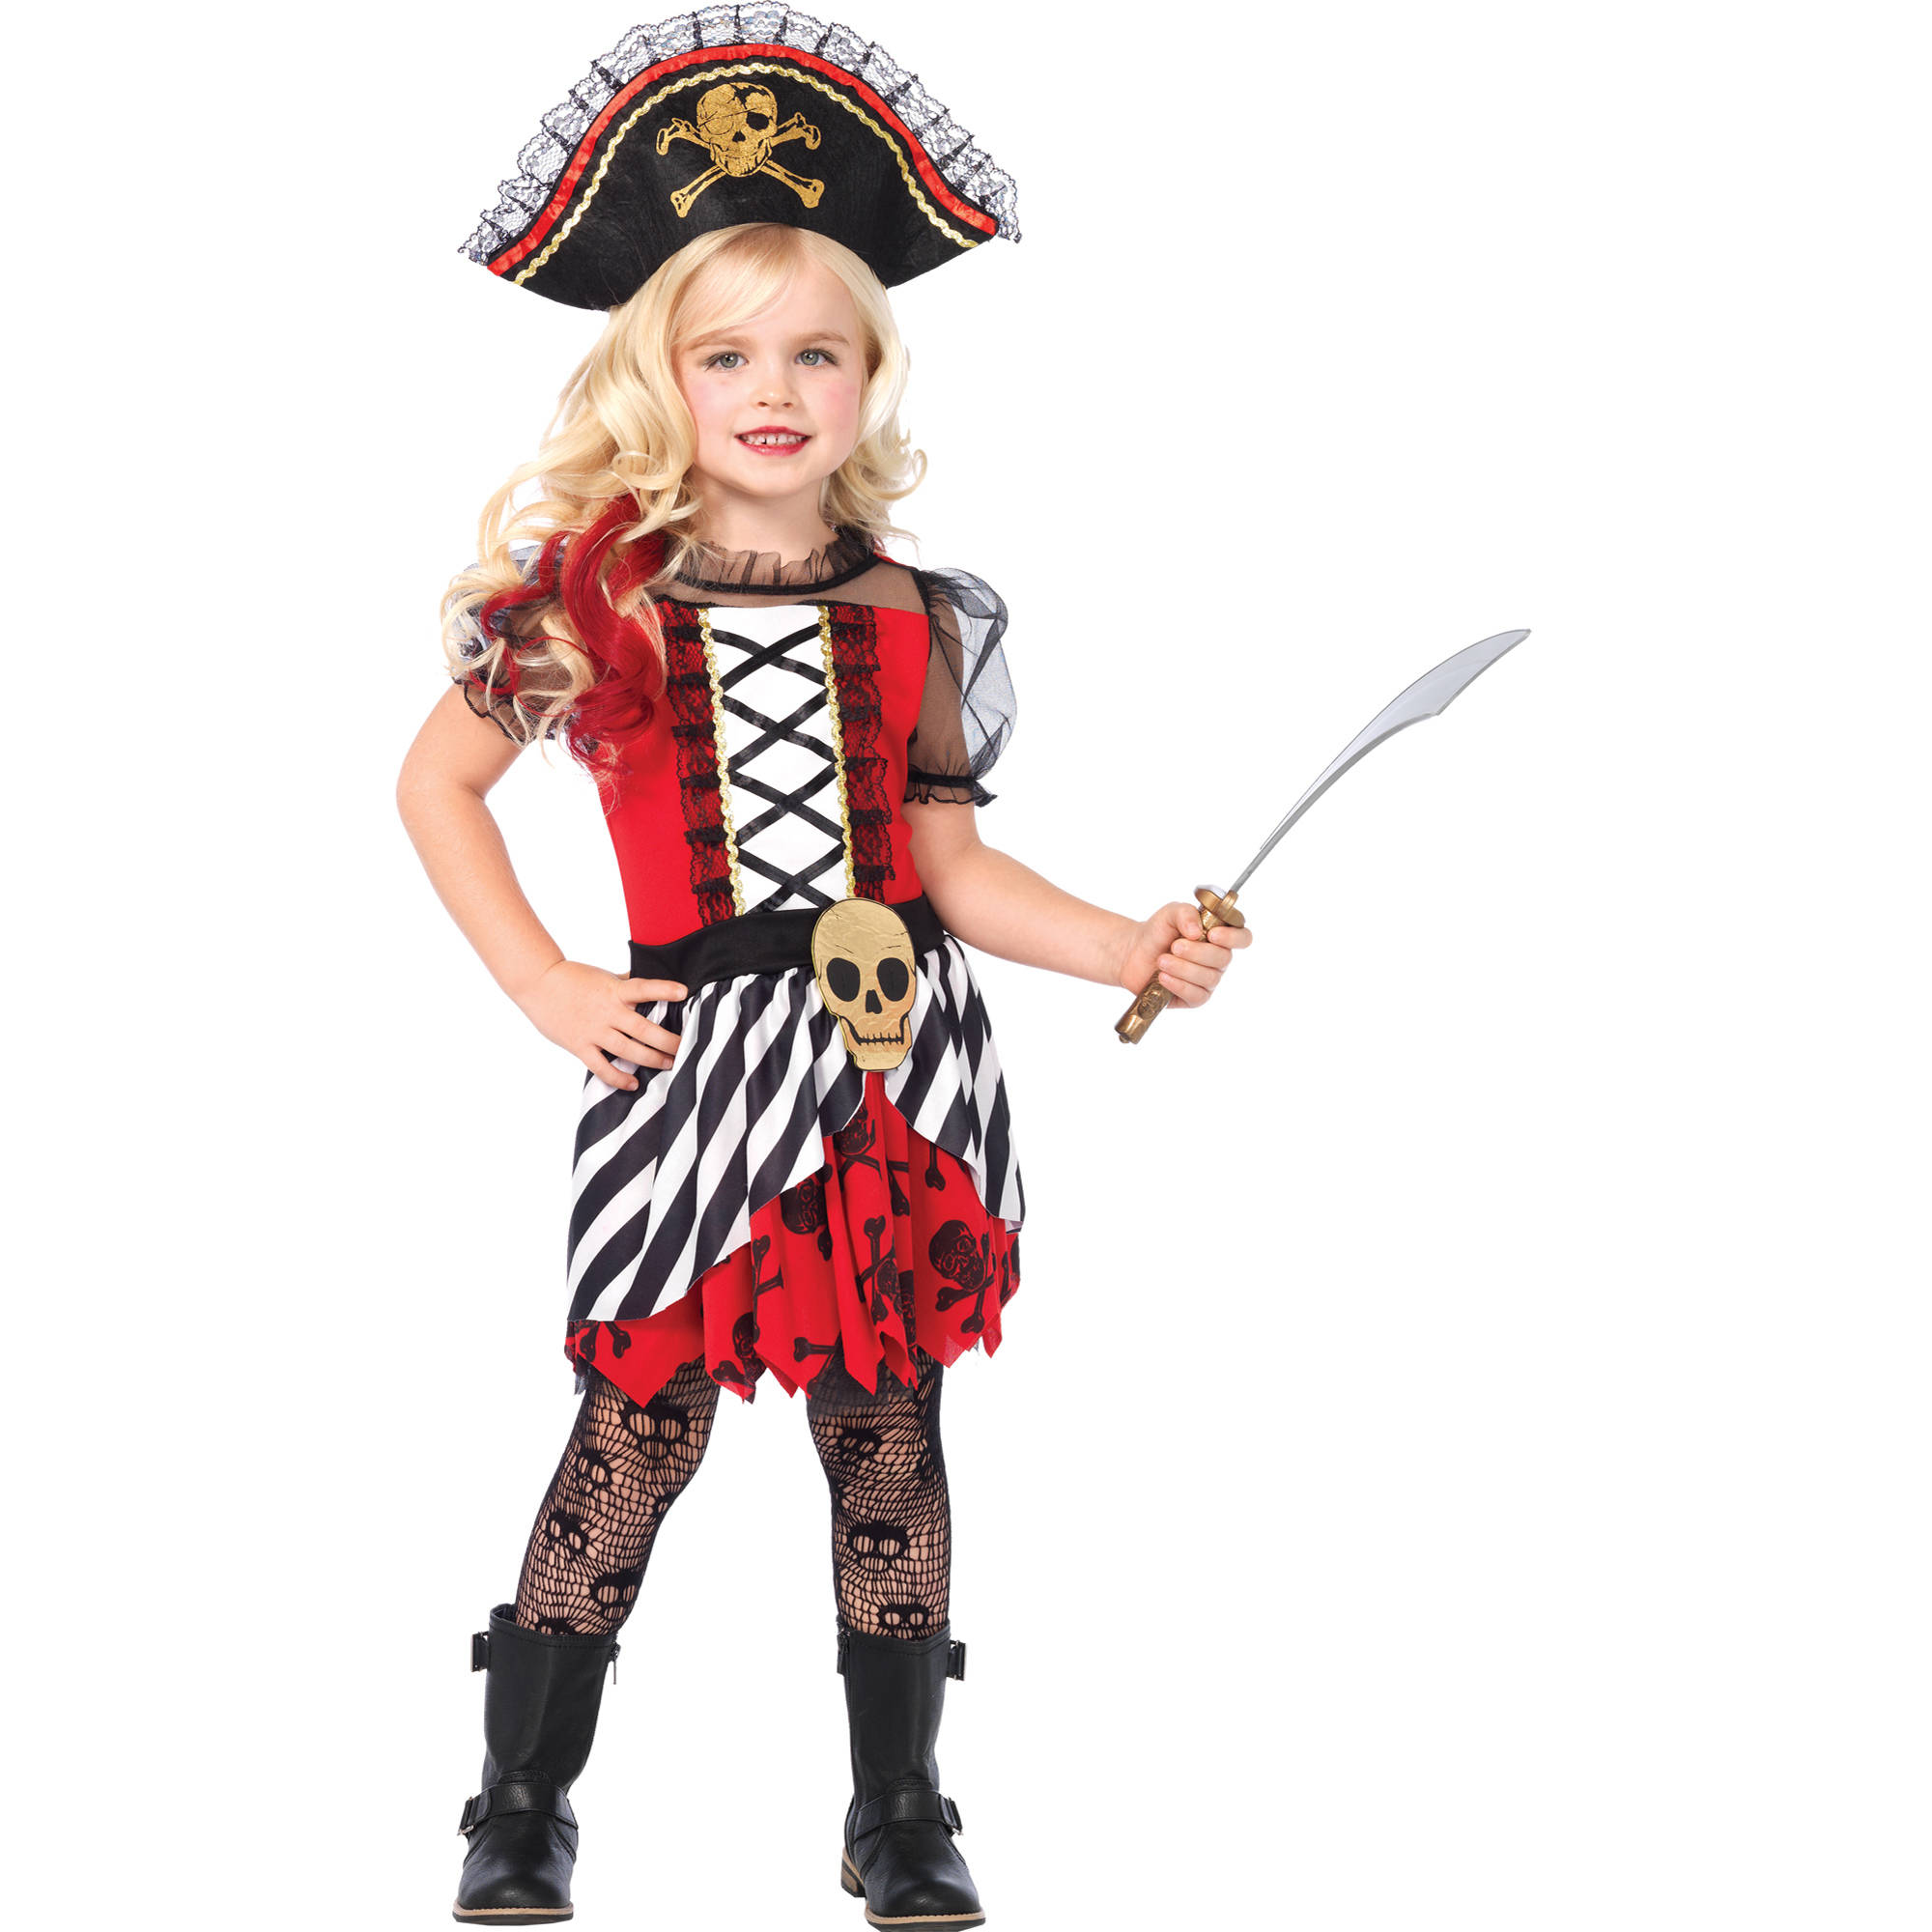 2PC. Girls' Rogue Pirate Dress w  Pirate Hat by Leg Avenue